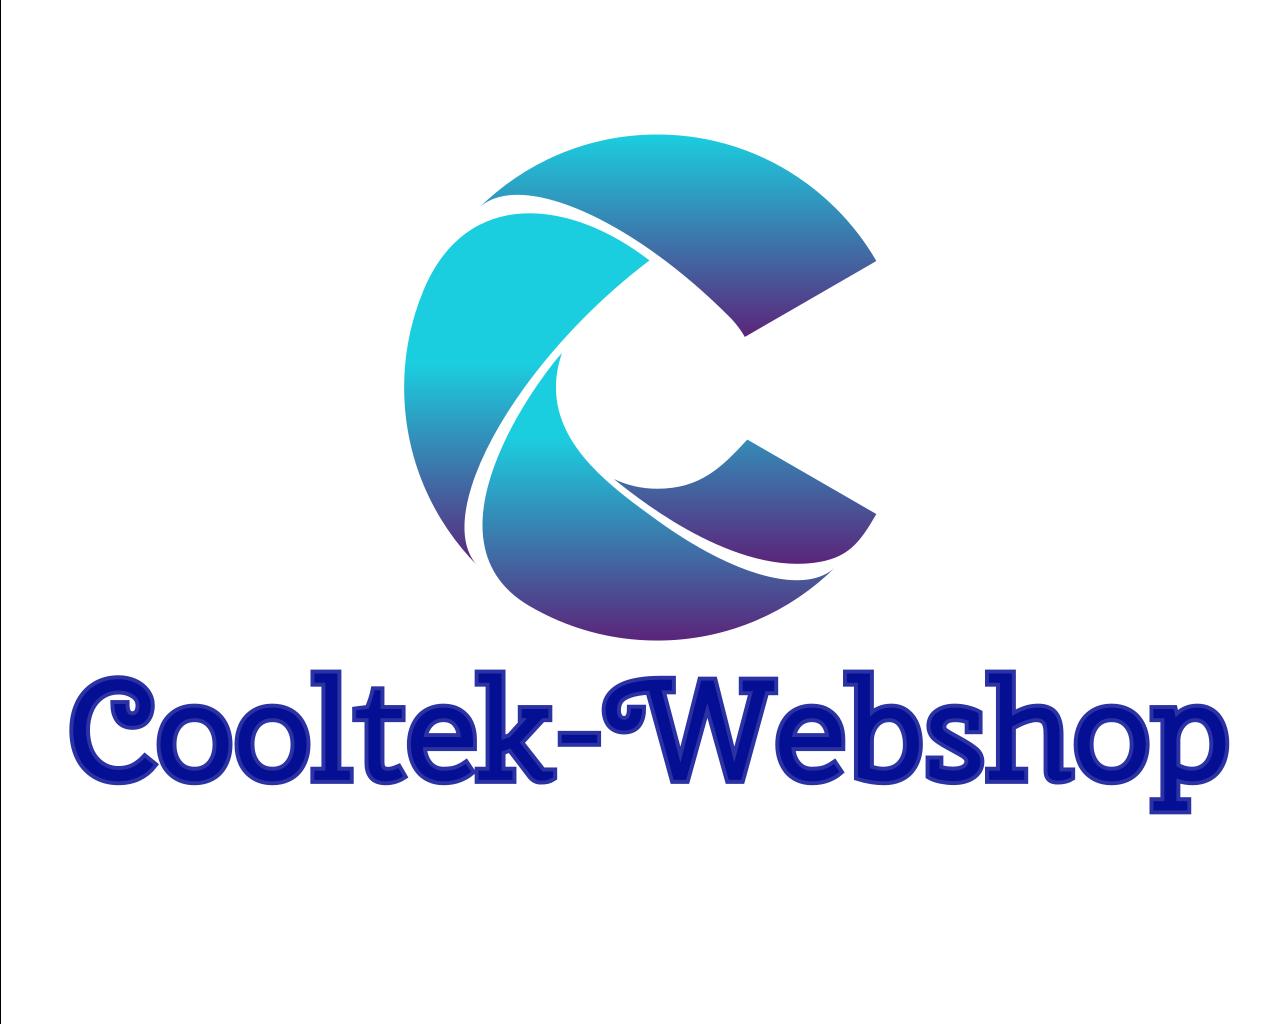 Cooltekwebshop.dk